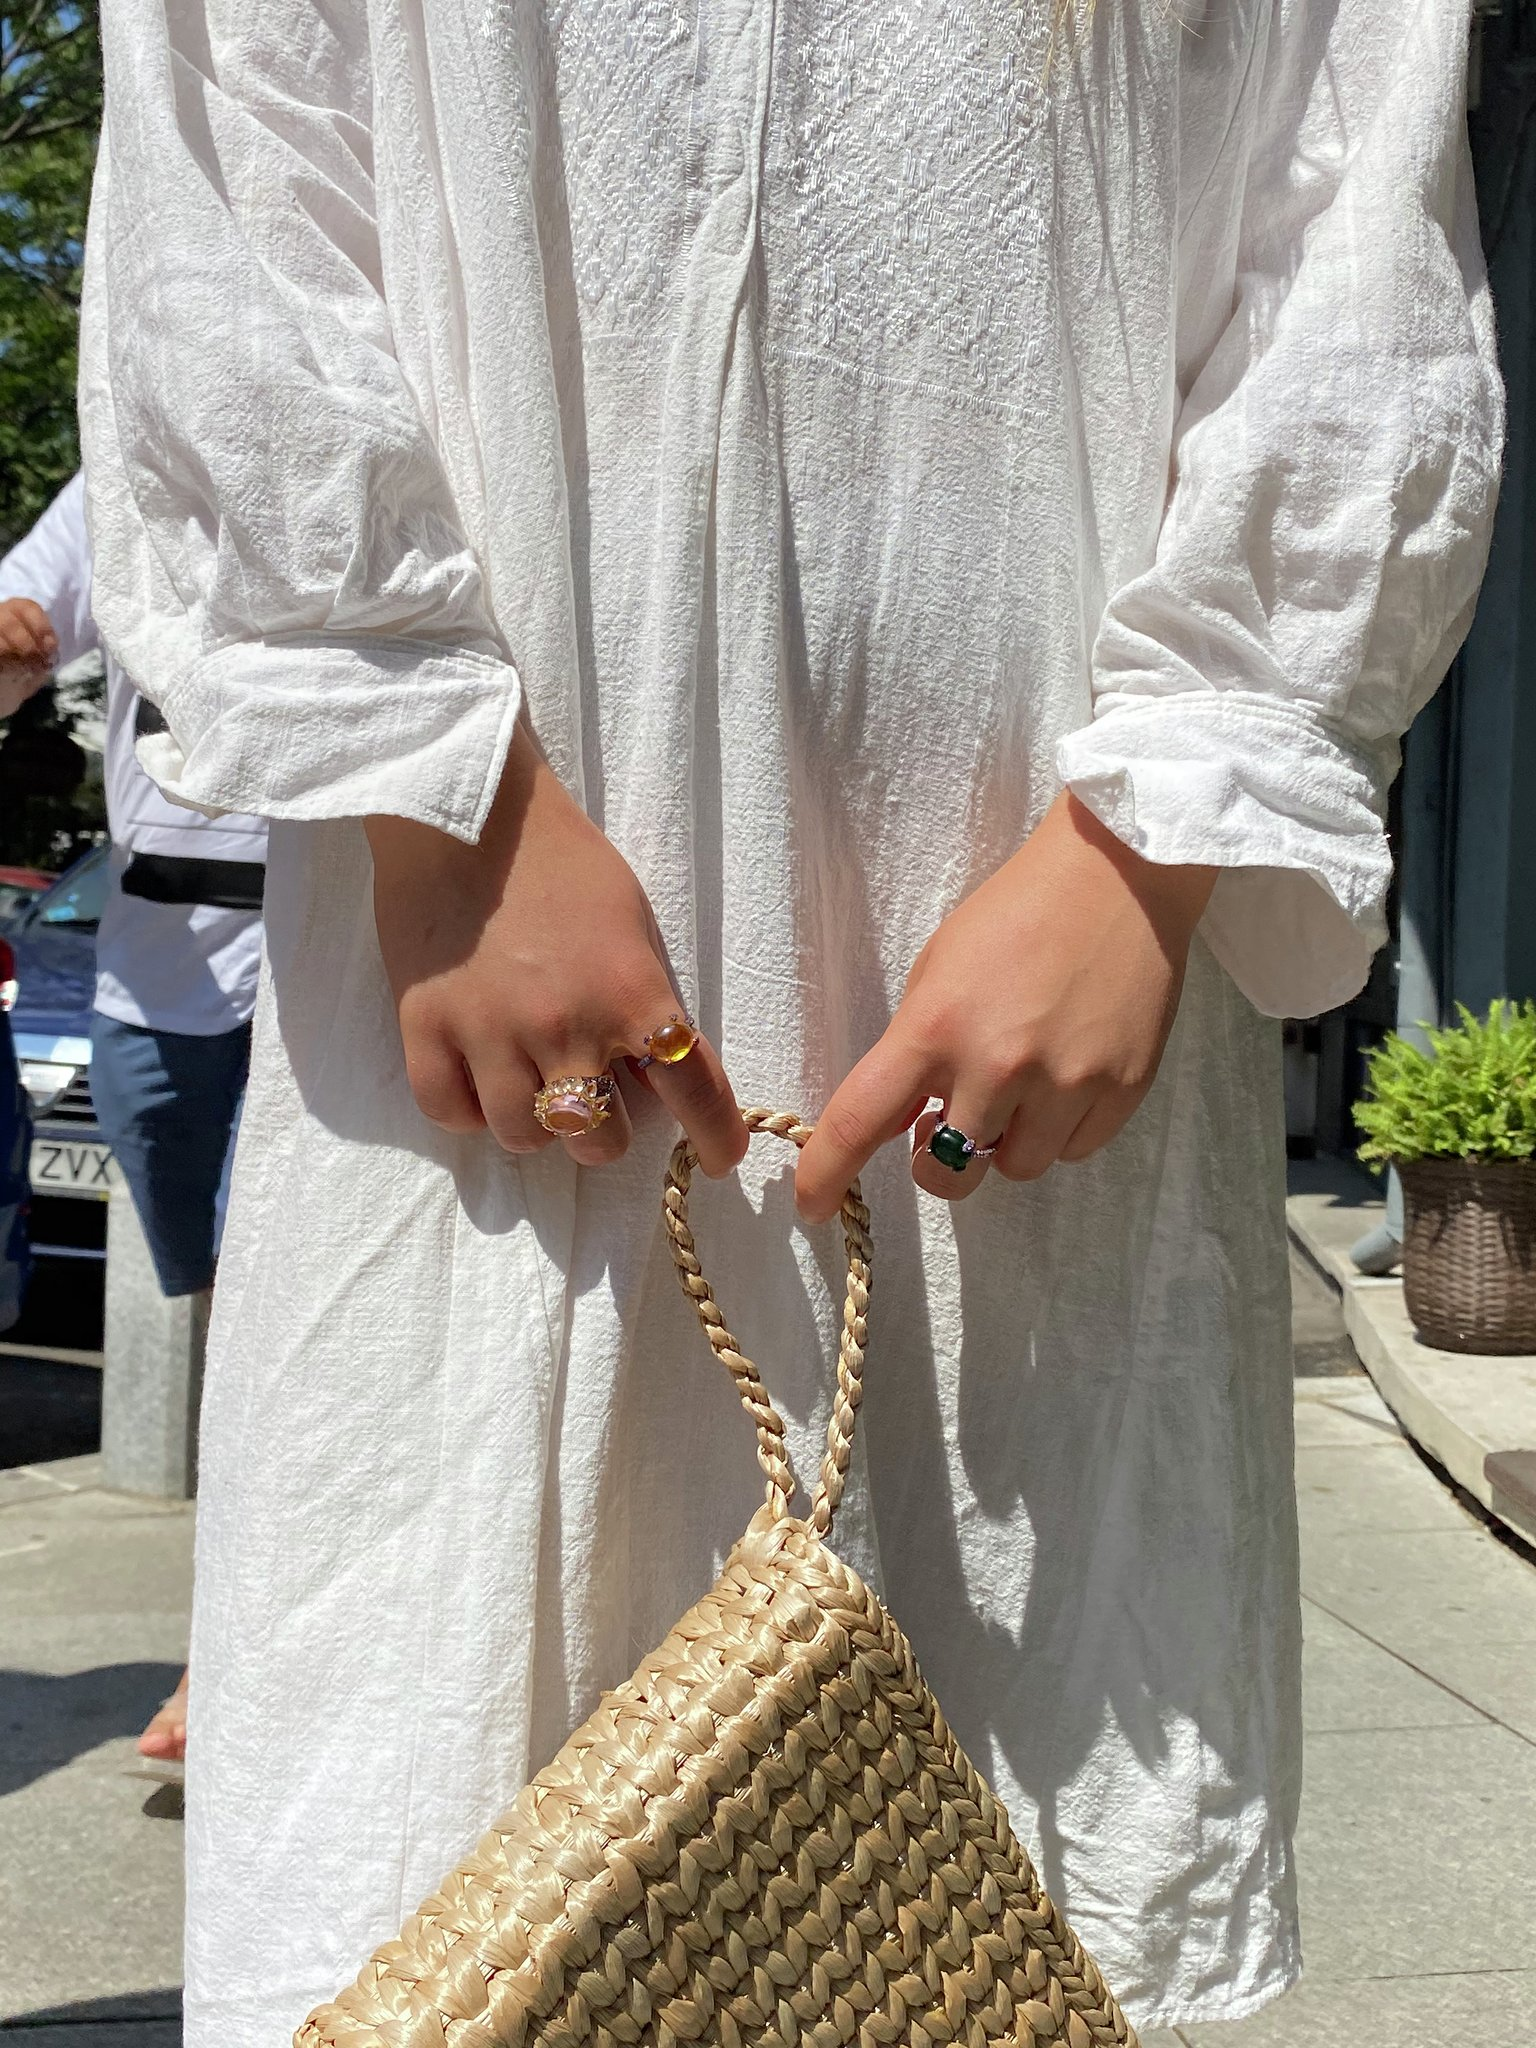 Romanian Vintage peasant linen dress from Mehedinti